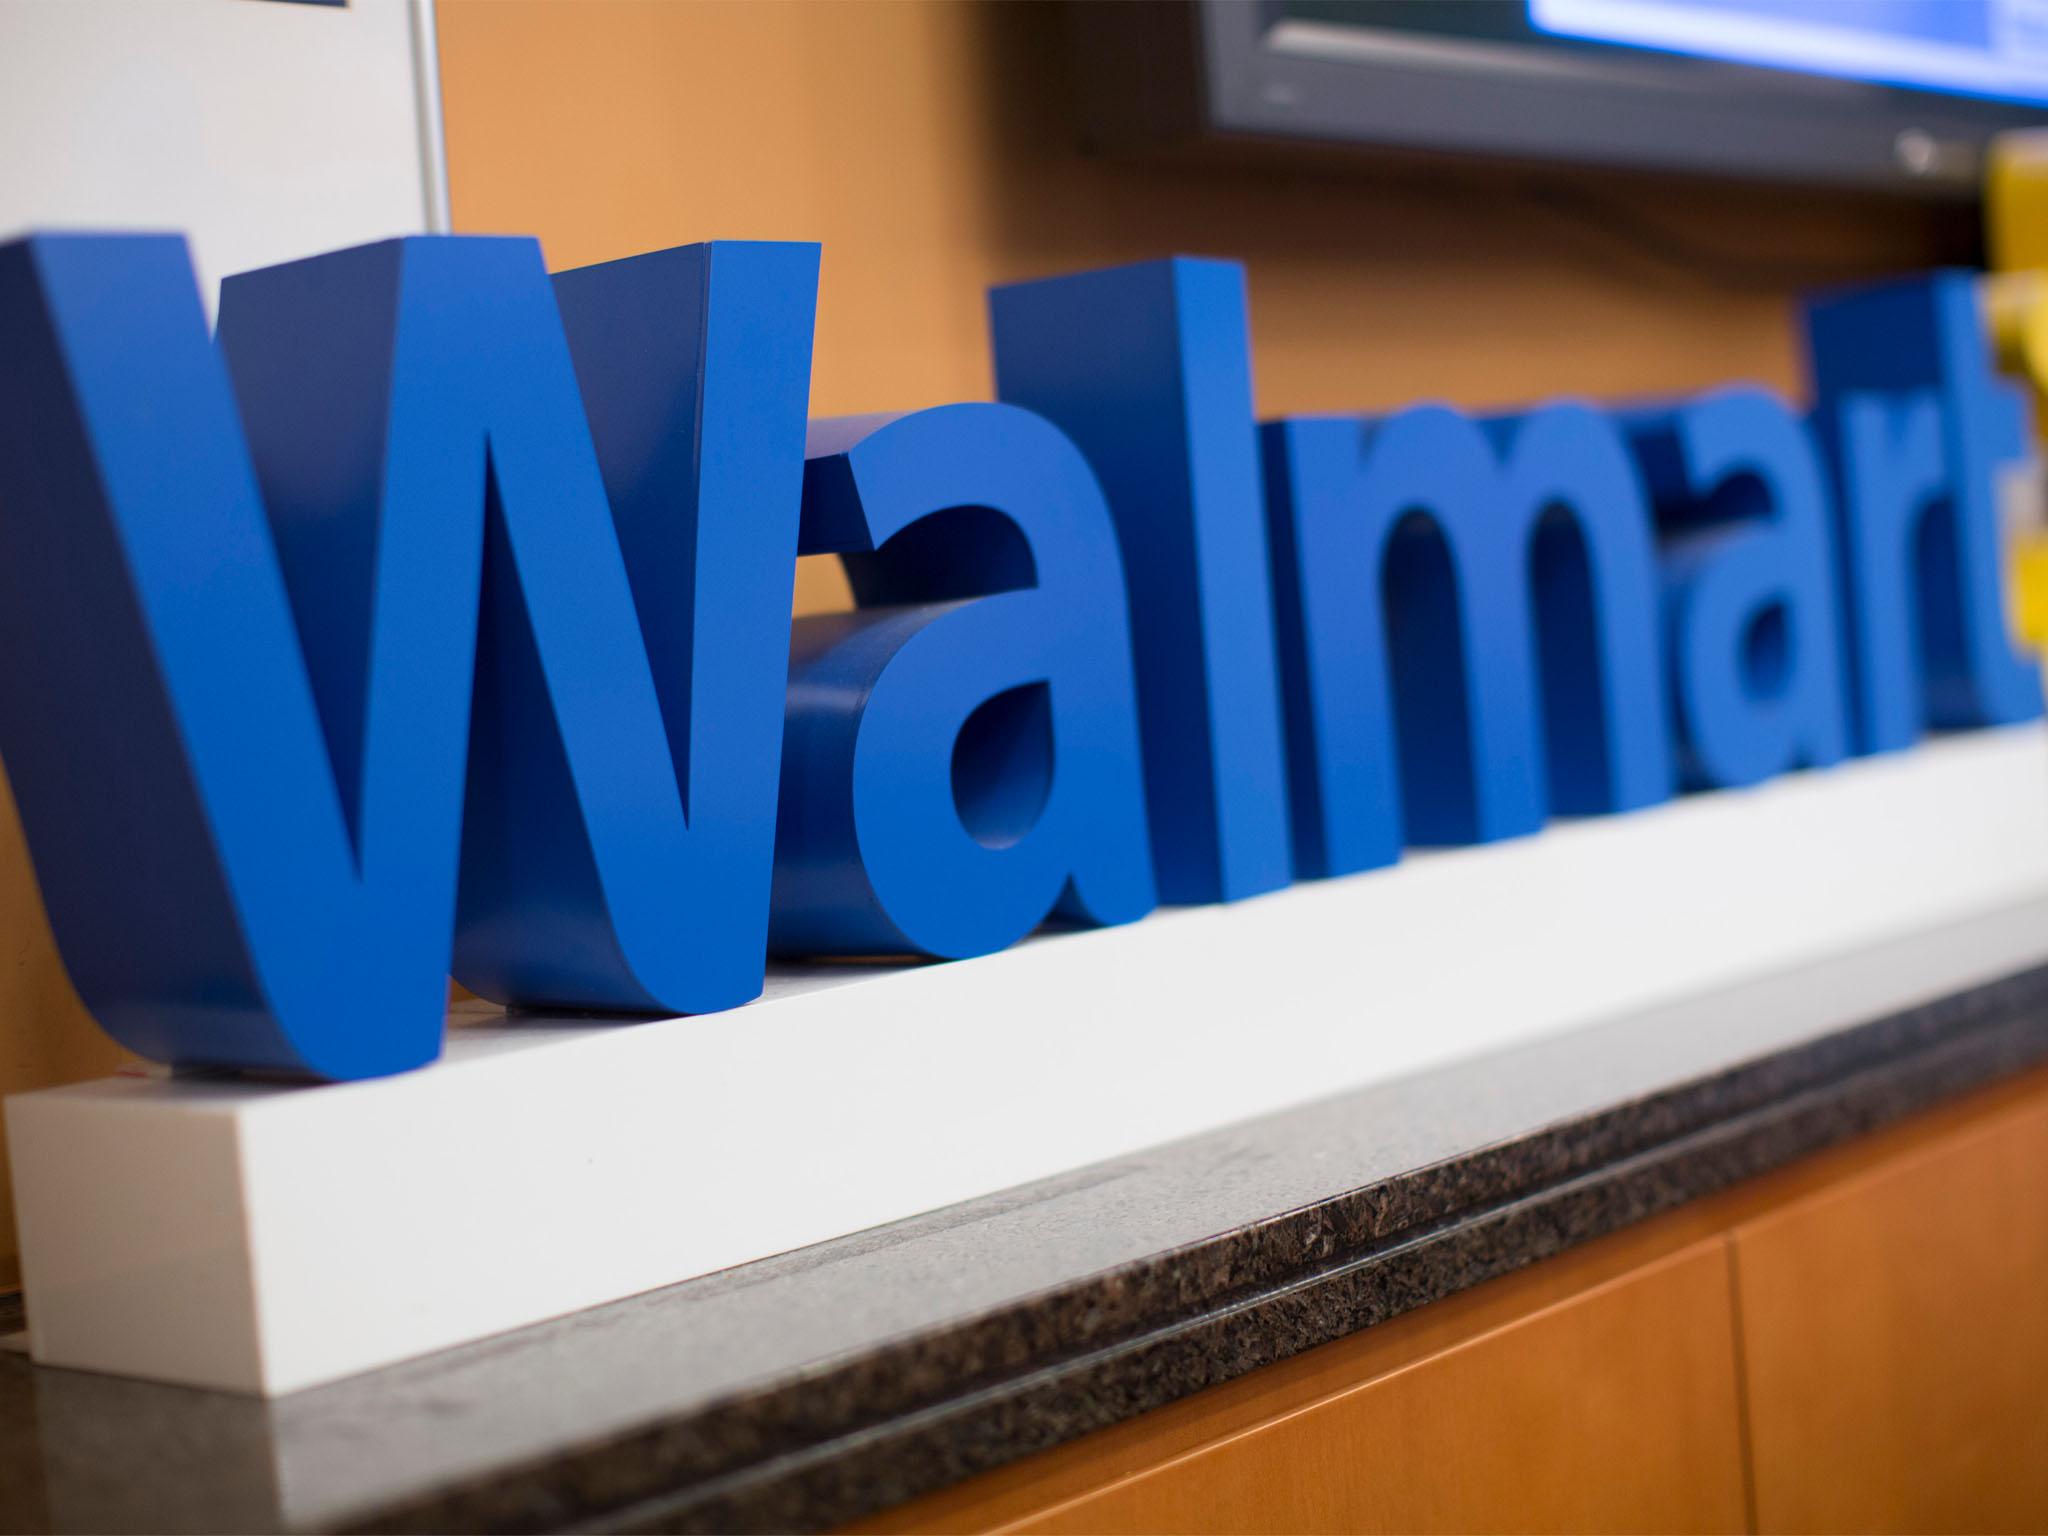 Walmart Lease Is At Citys Doorstep